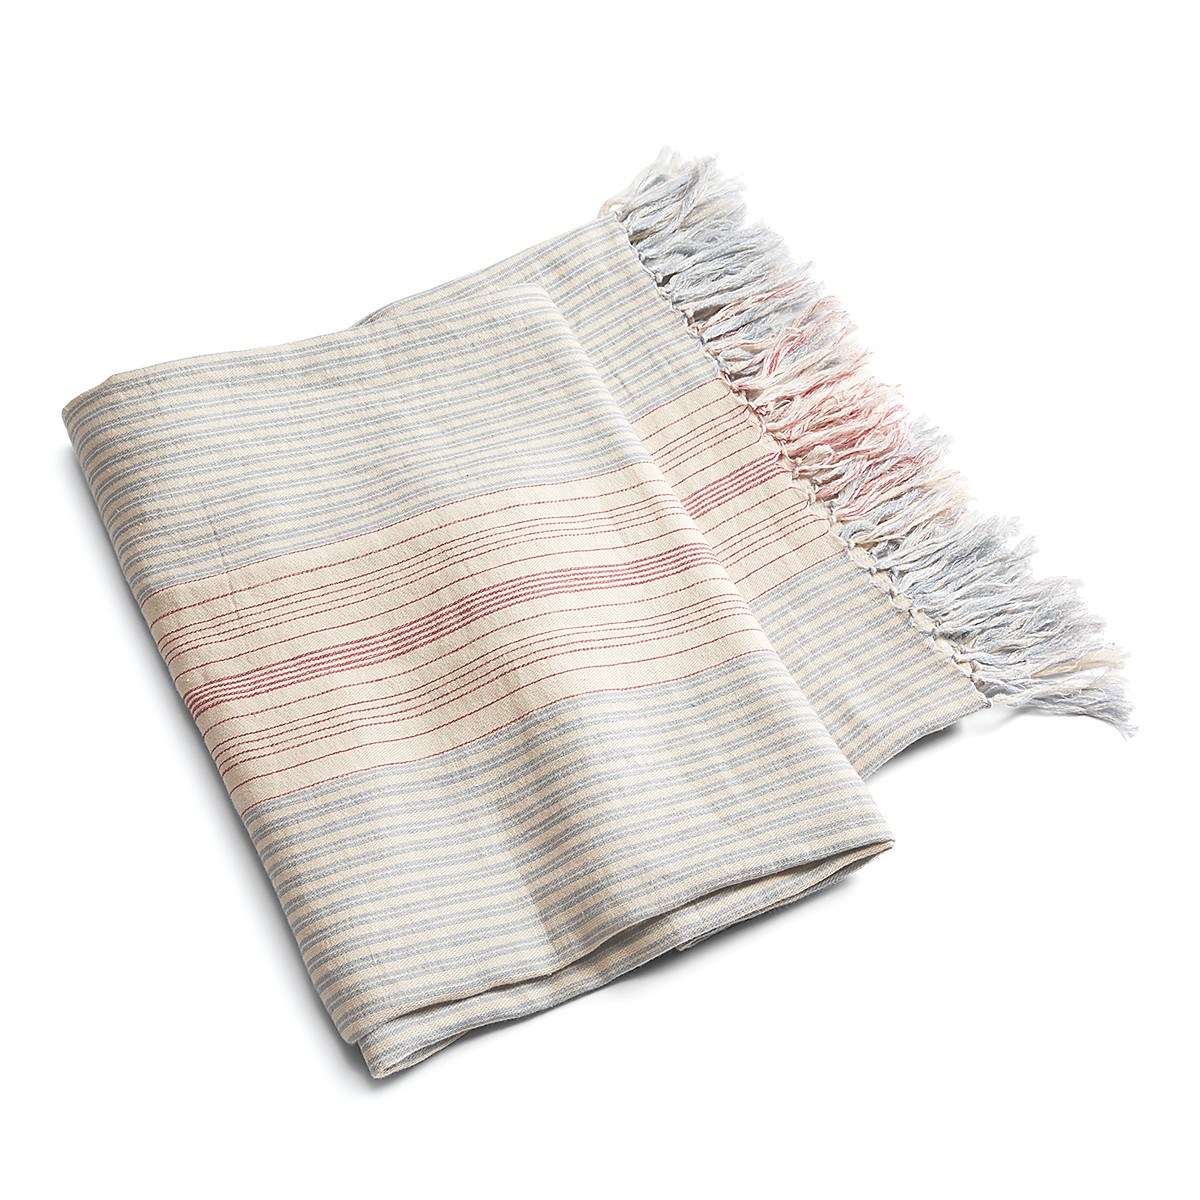 Linen Wedding Anniversary Gifts, Throw Blanket